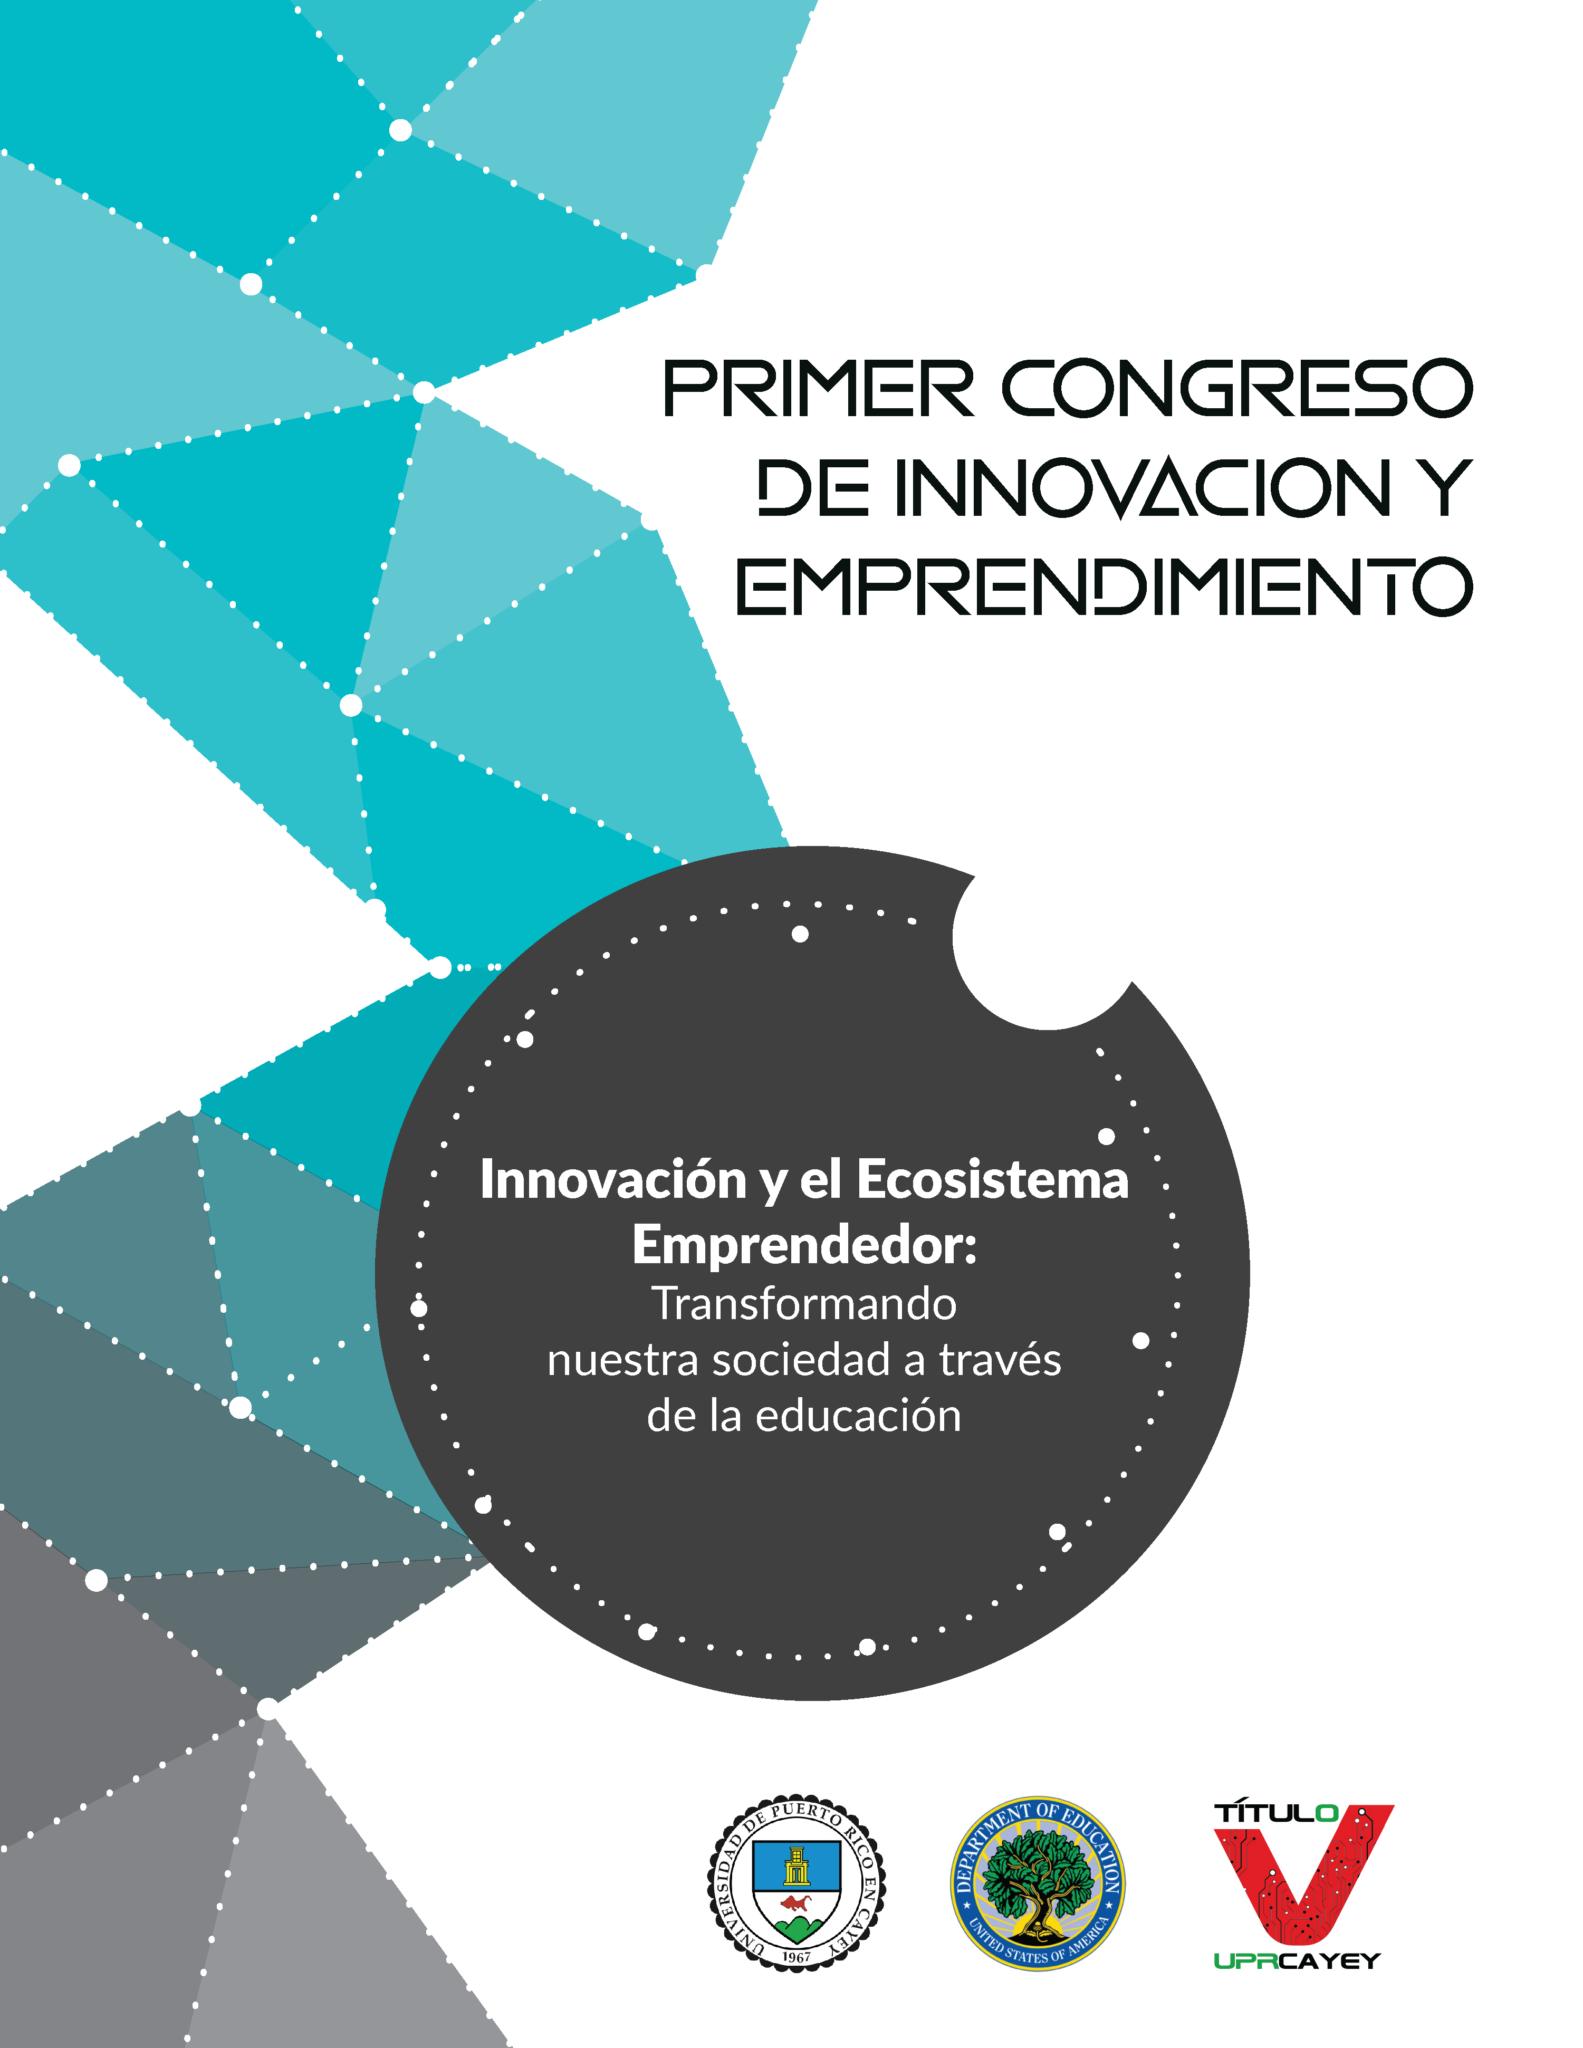 Imagen del First Congress of Innovation and Entrepreneurship Programme